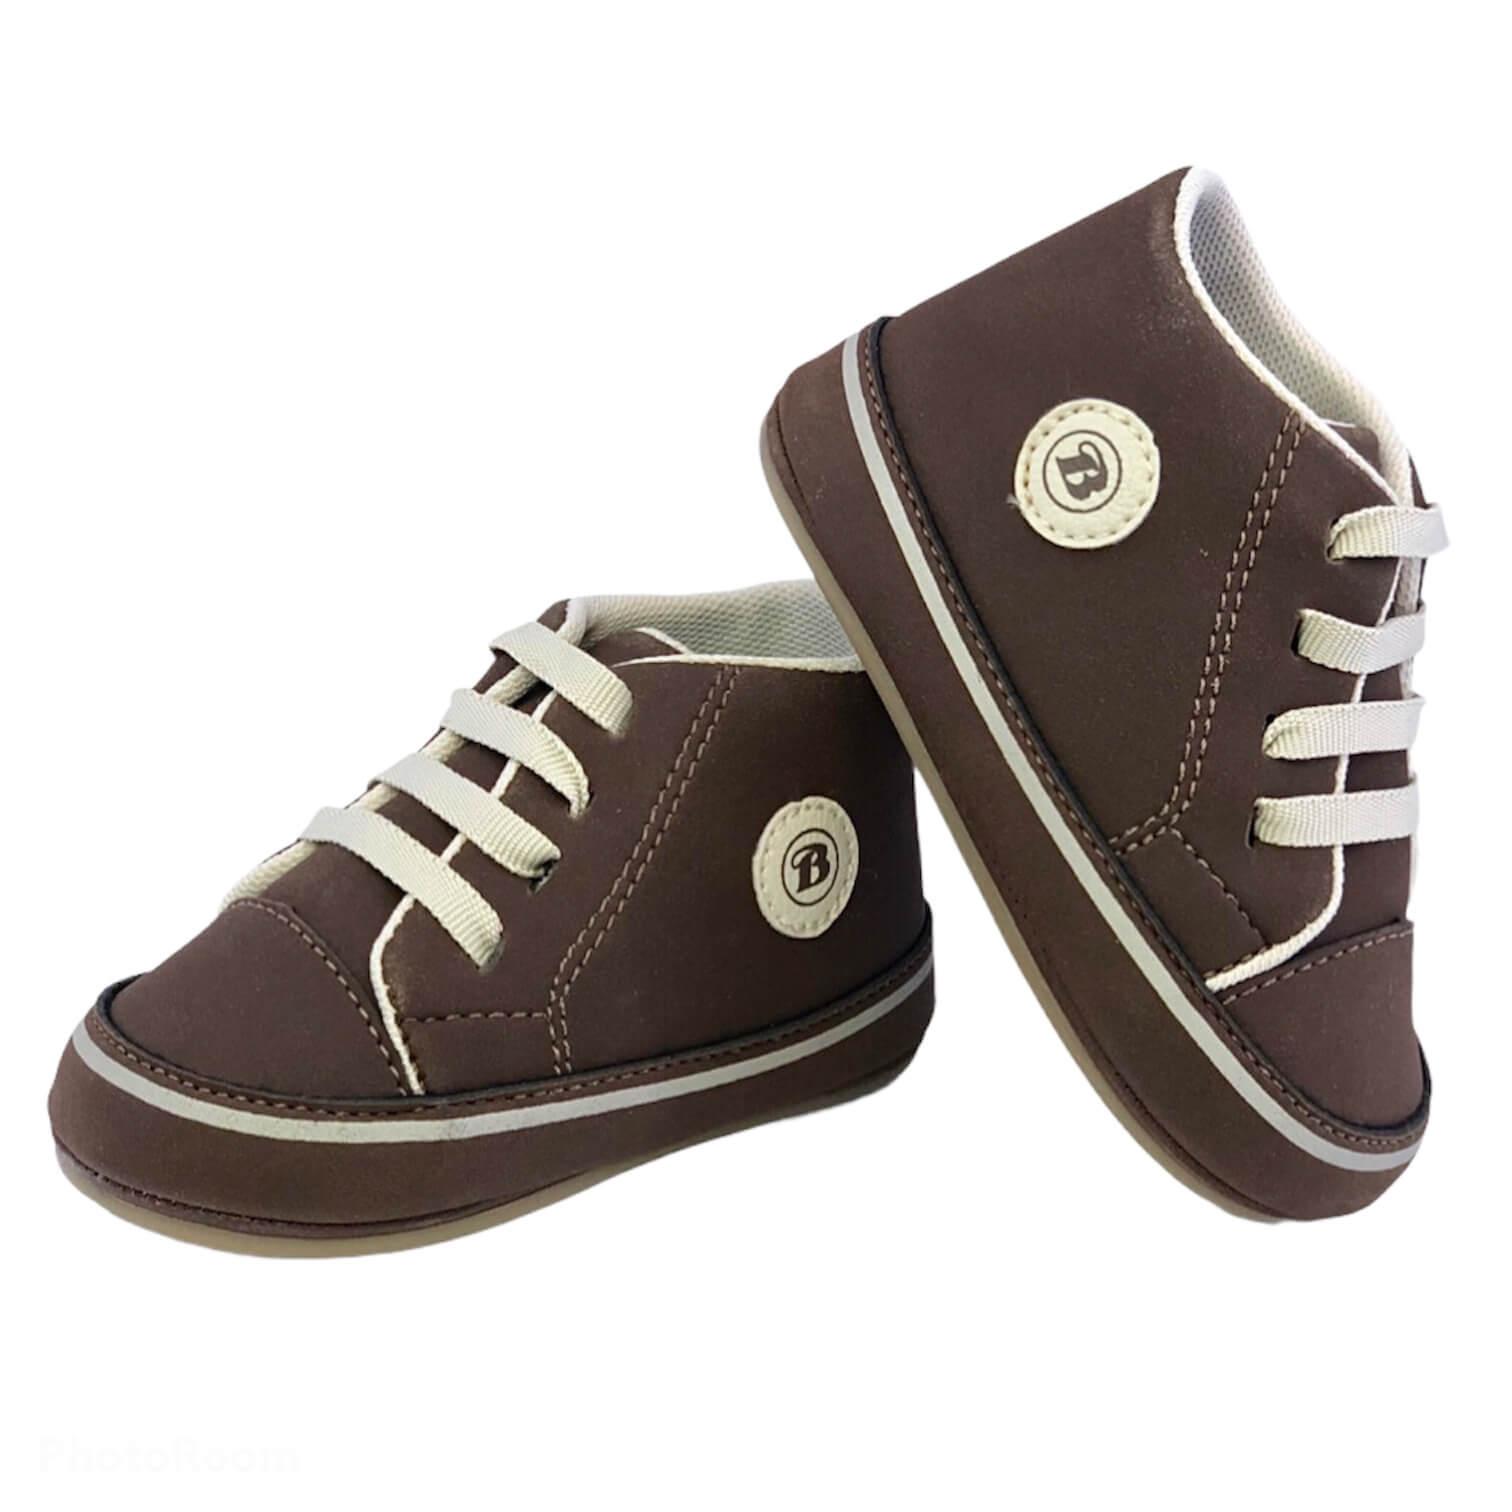 Sapato Stevy Marrom Cano Alto